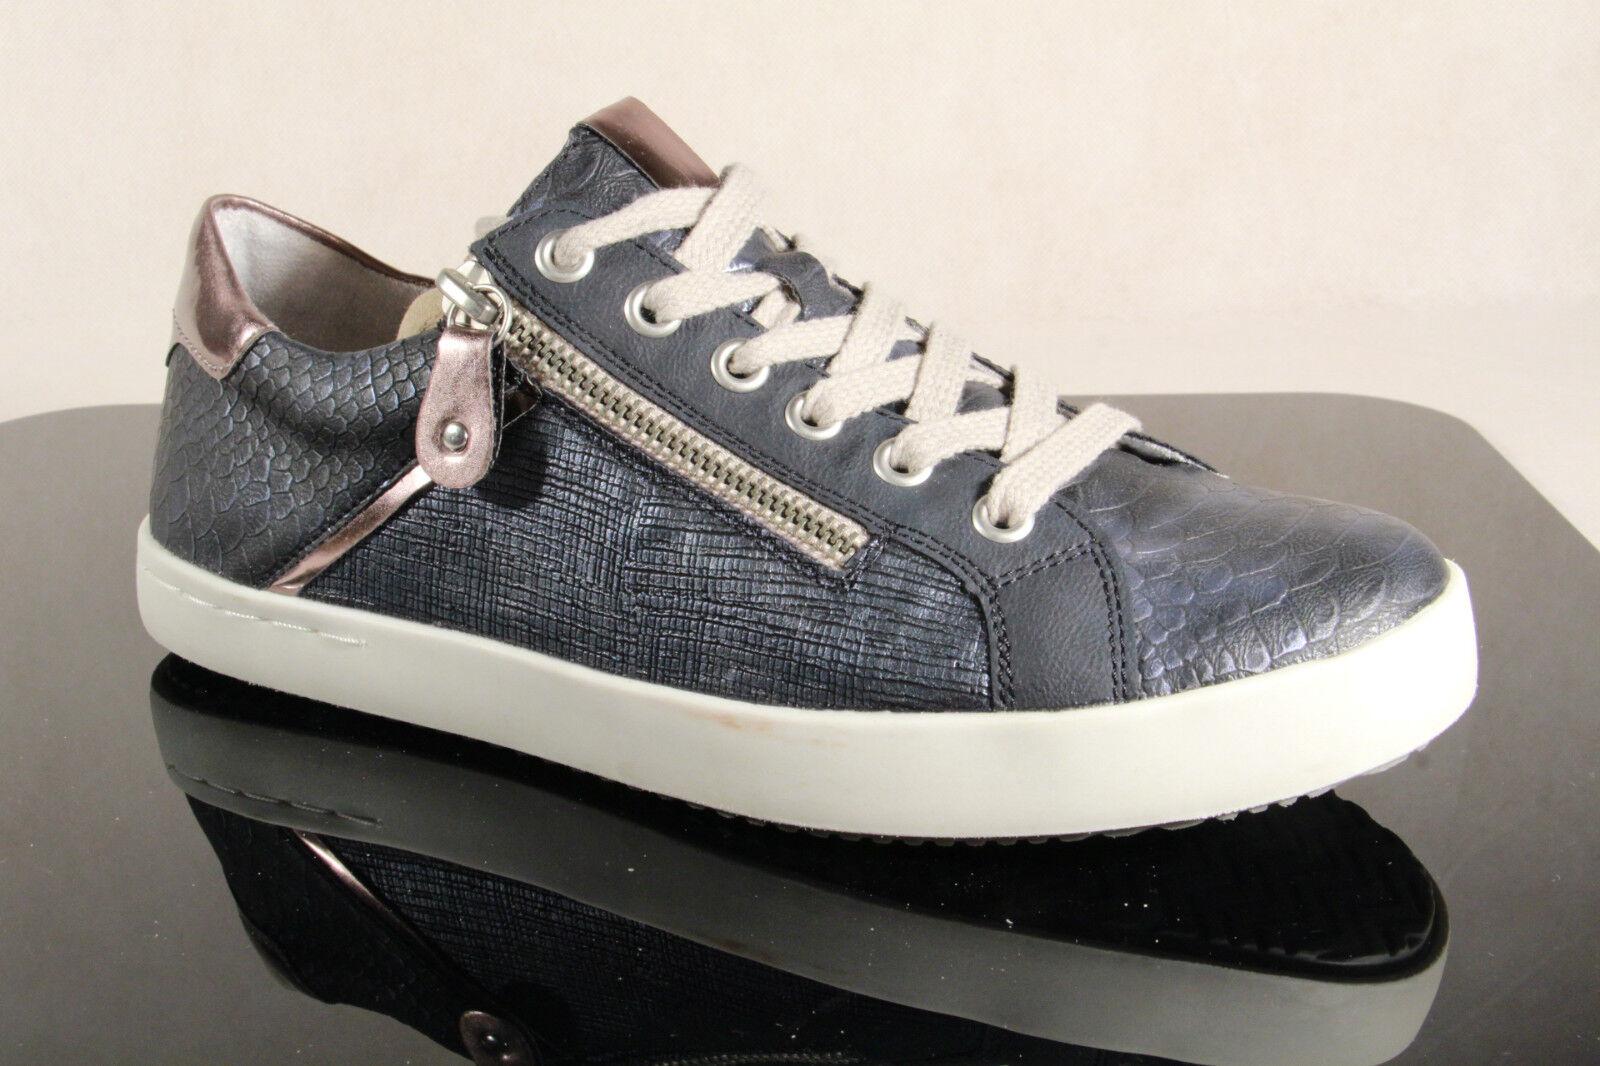 Zapatos casuales salvajes Descuento por tiempo limitado Remonte Schnürschuhe D5201 Sneakers Halbschuhe D5201 Schnürschuhe blau  NEU! c03fde